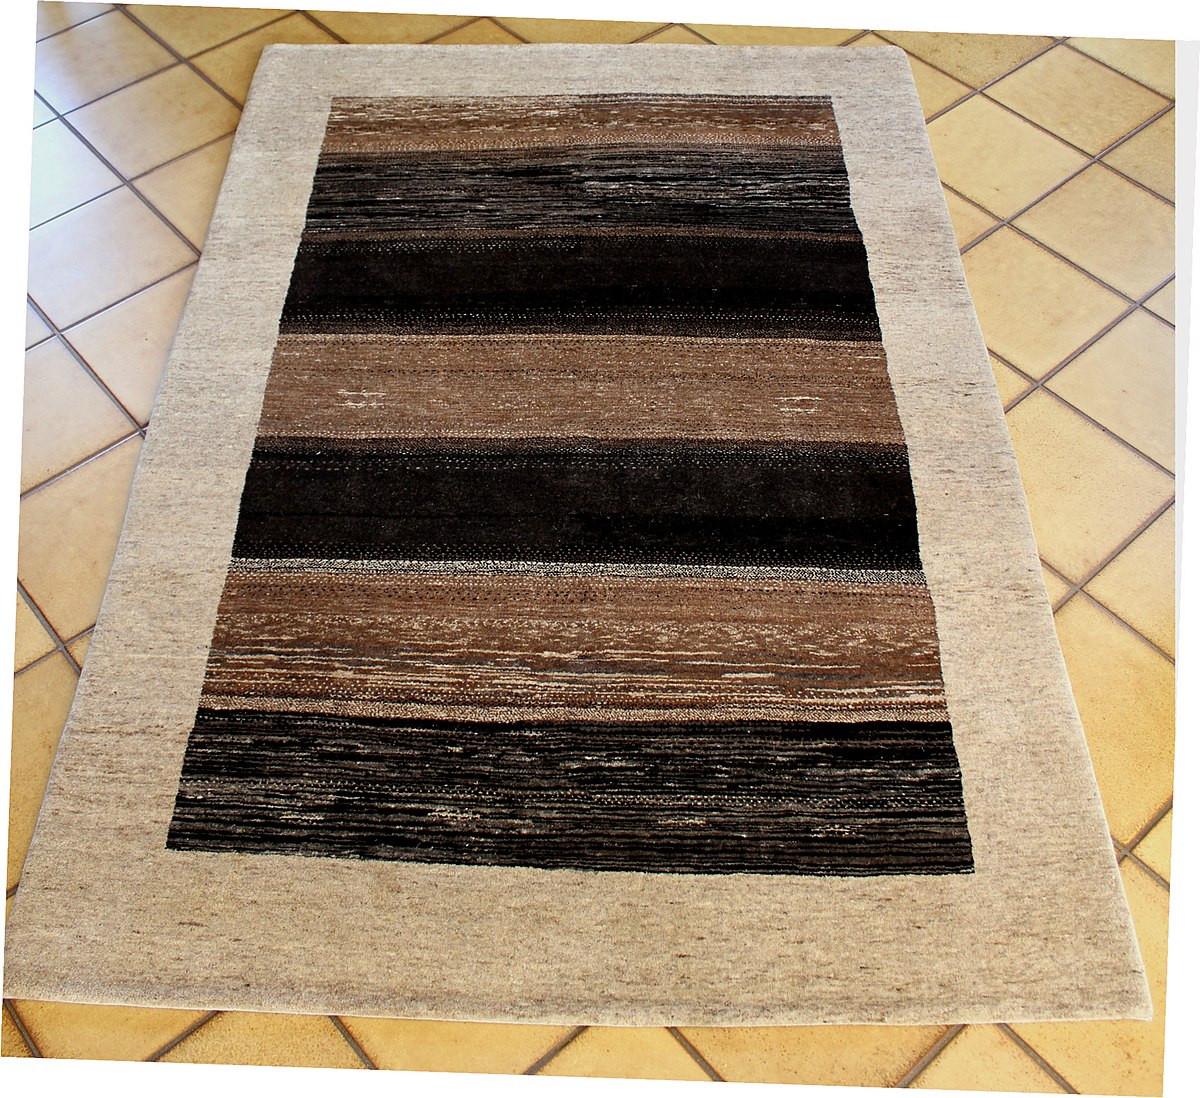 original hardwood floors under carpet of carpet wikipedia with regard to 1200px wollteppich 1